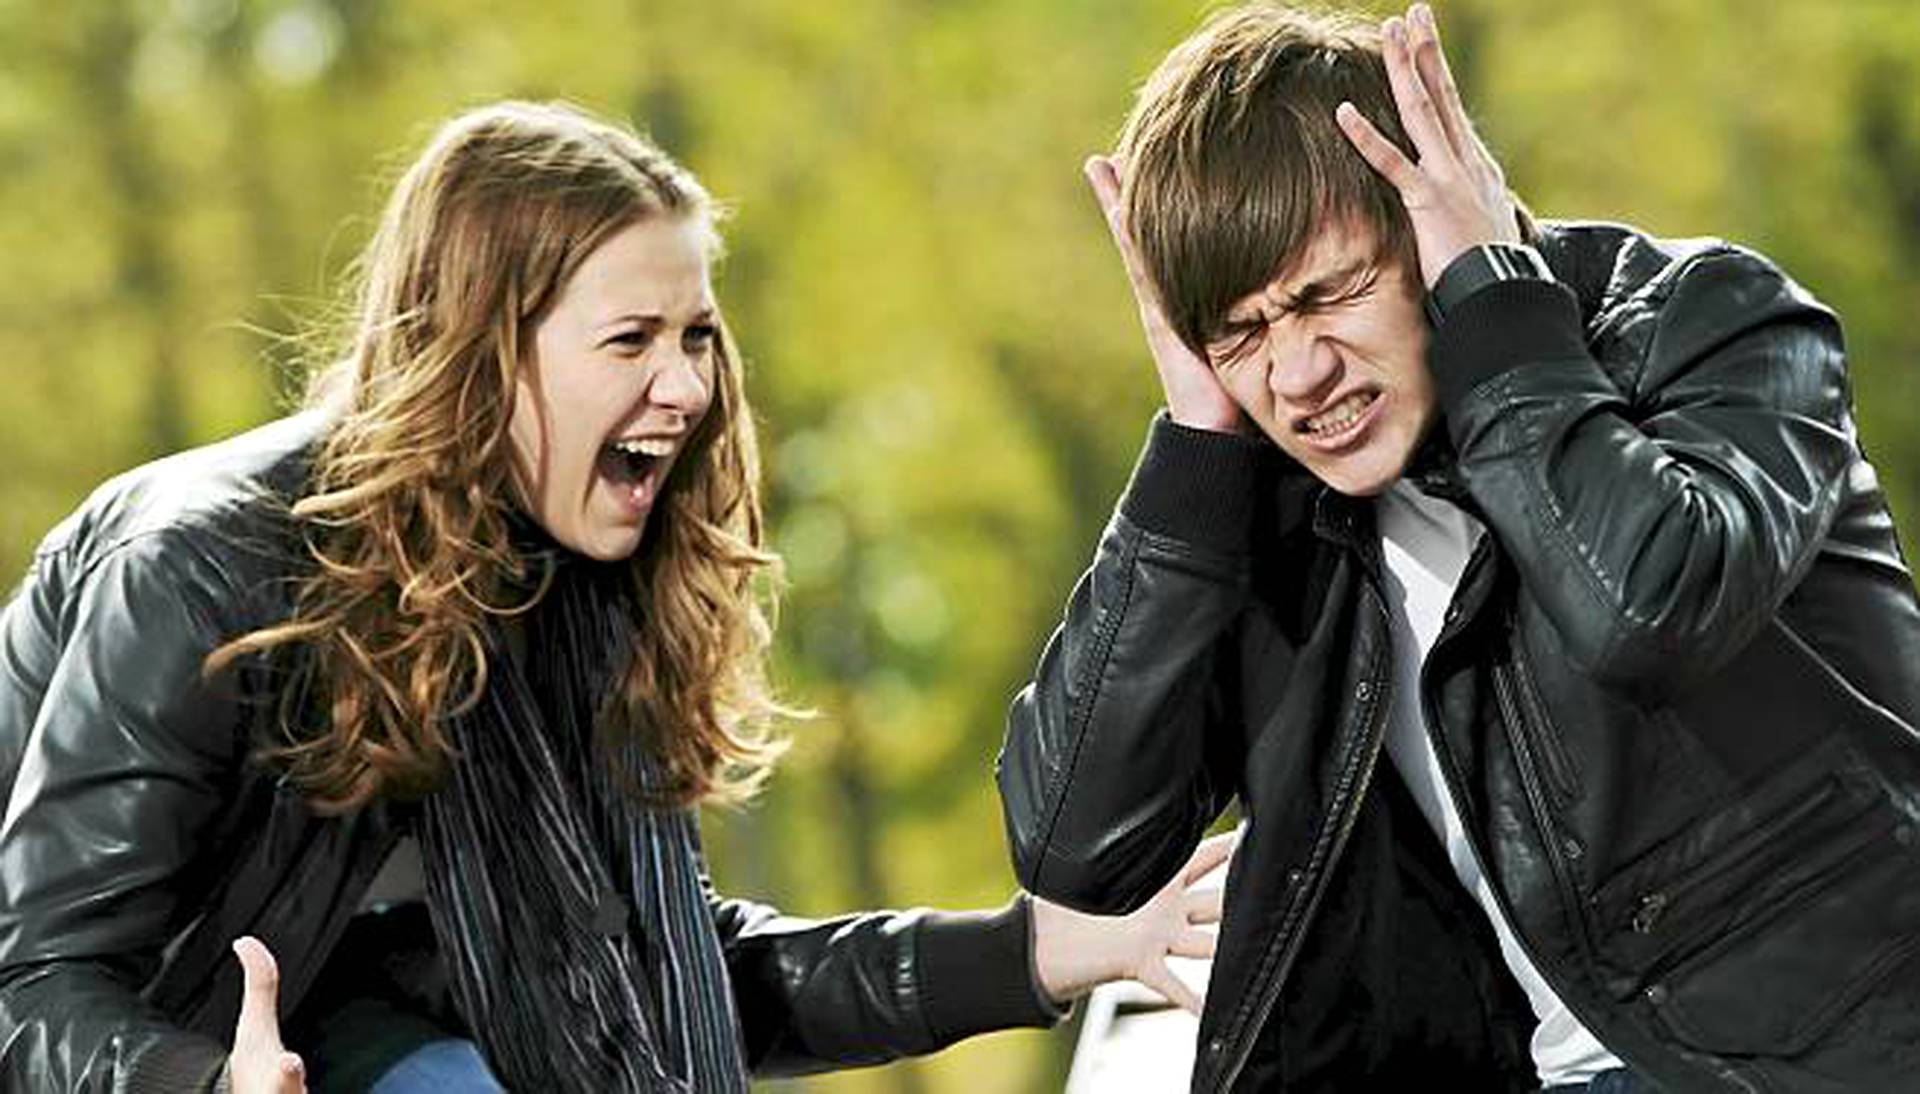 haittoja dating eronnut mies